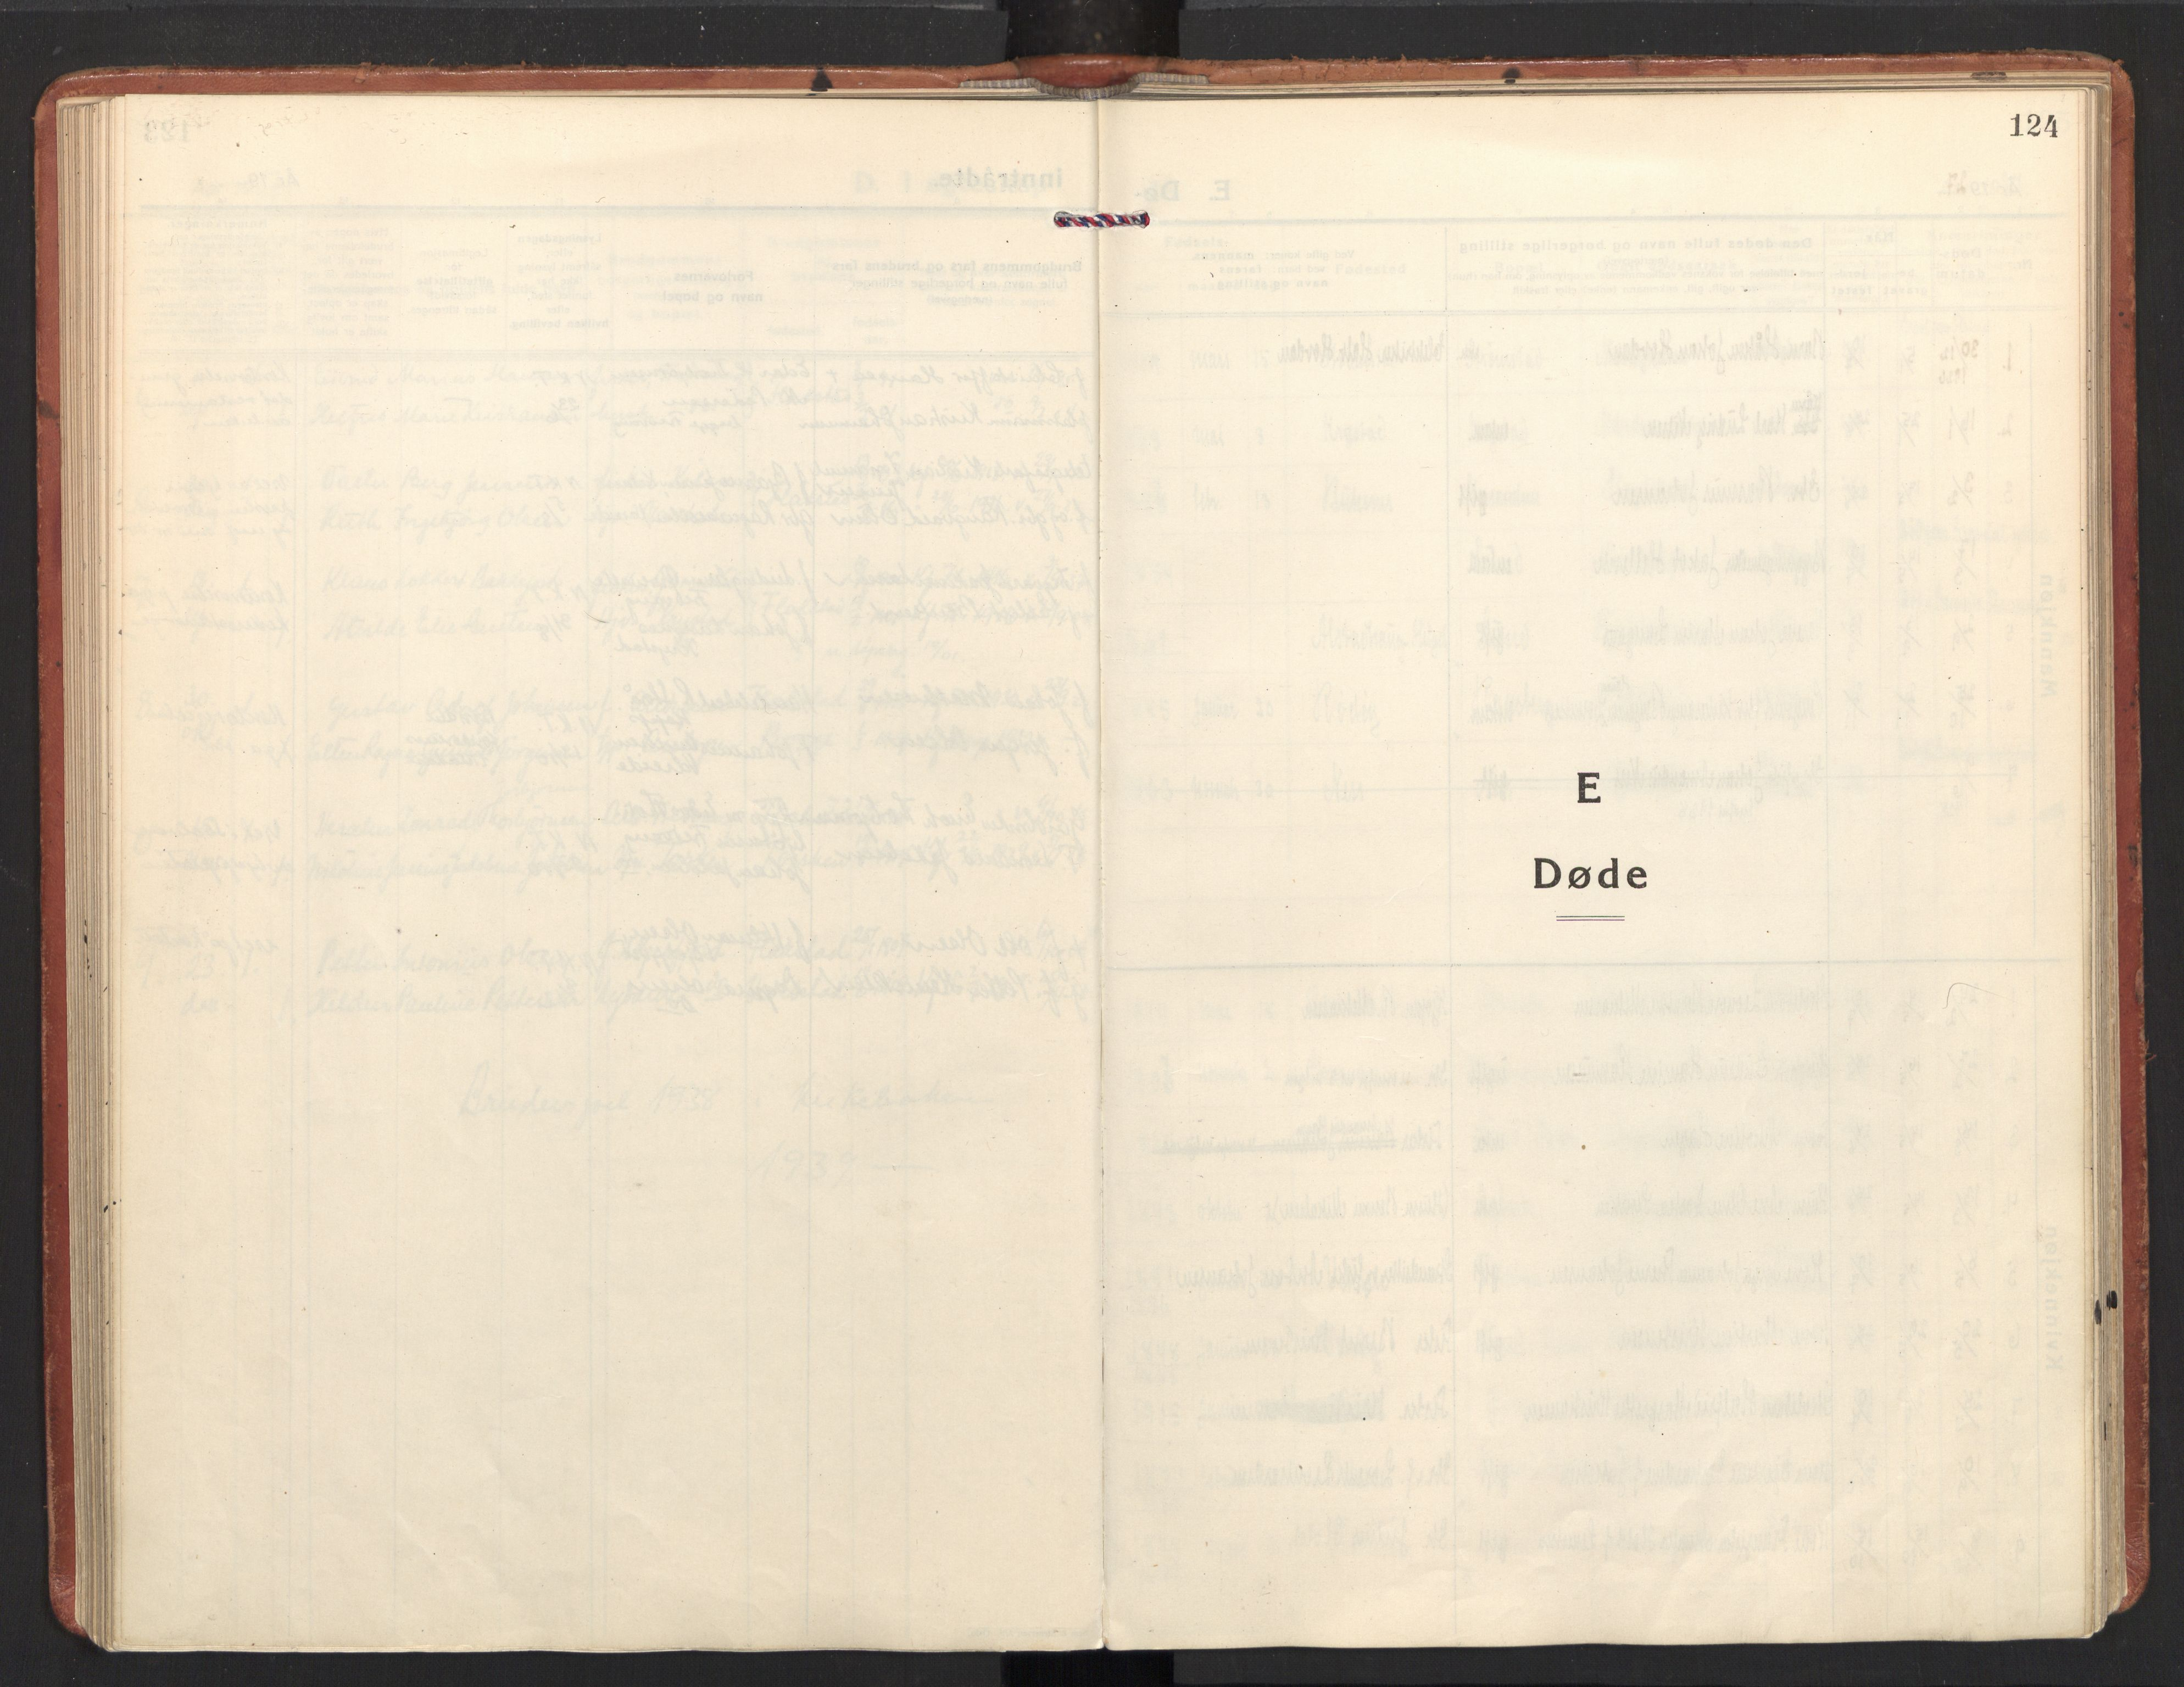 SAT, Ministerialprotokoller, klokkerbøker og fødselsregistre - Nordland, 885/L1211: Ministerialbok nr. 885A11, 1927-1938, s. 124